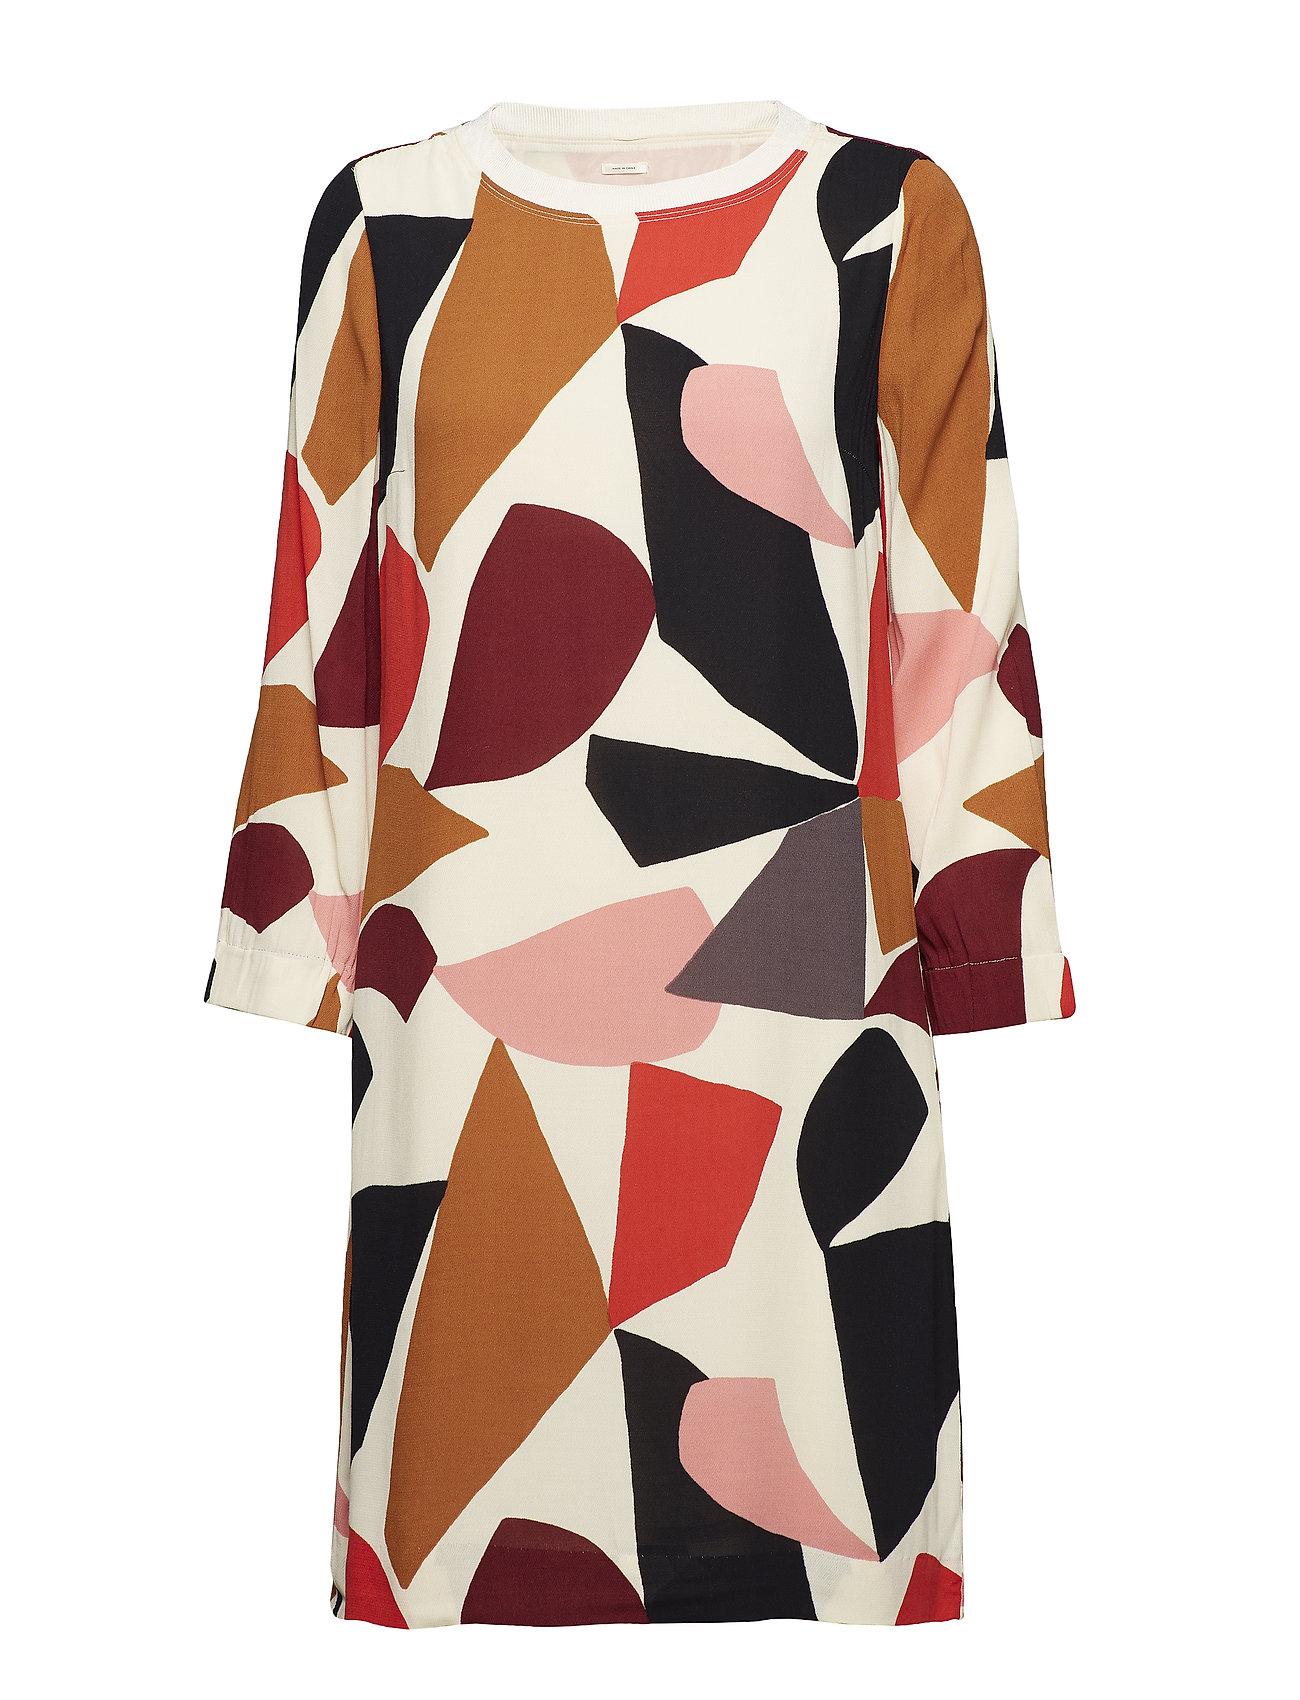 Image of Vexi Short Dress Lw Kort Kjole Multi/mønstret InWear (3406140001)